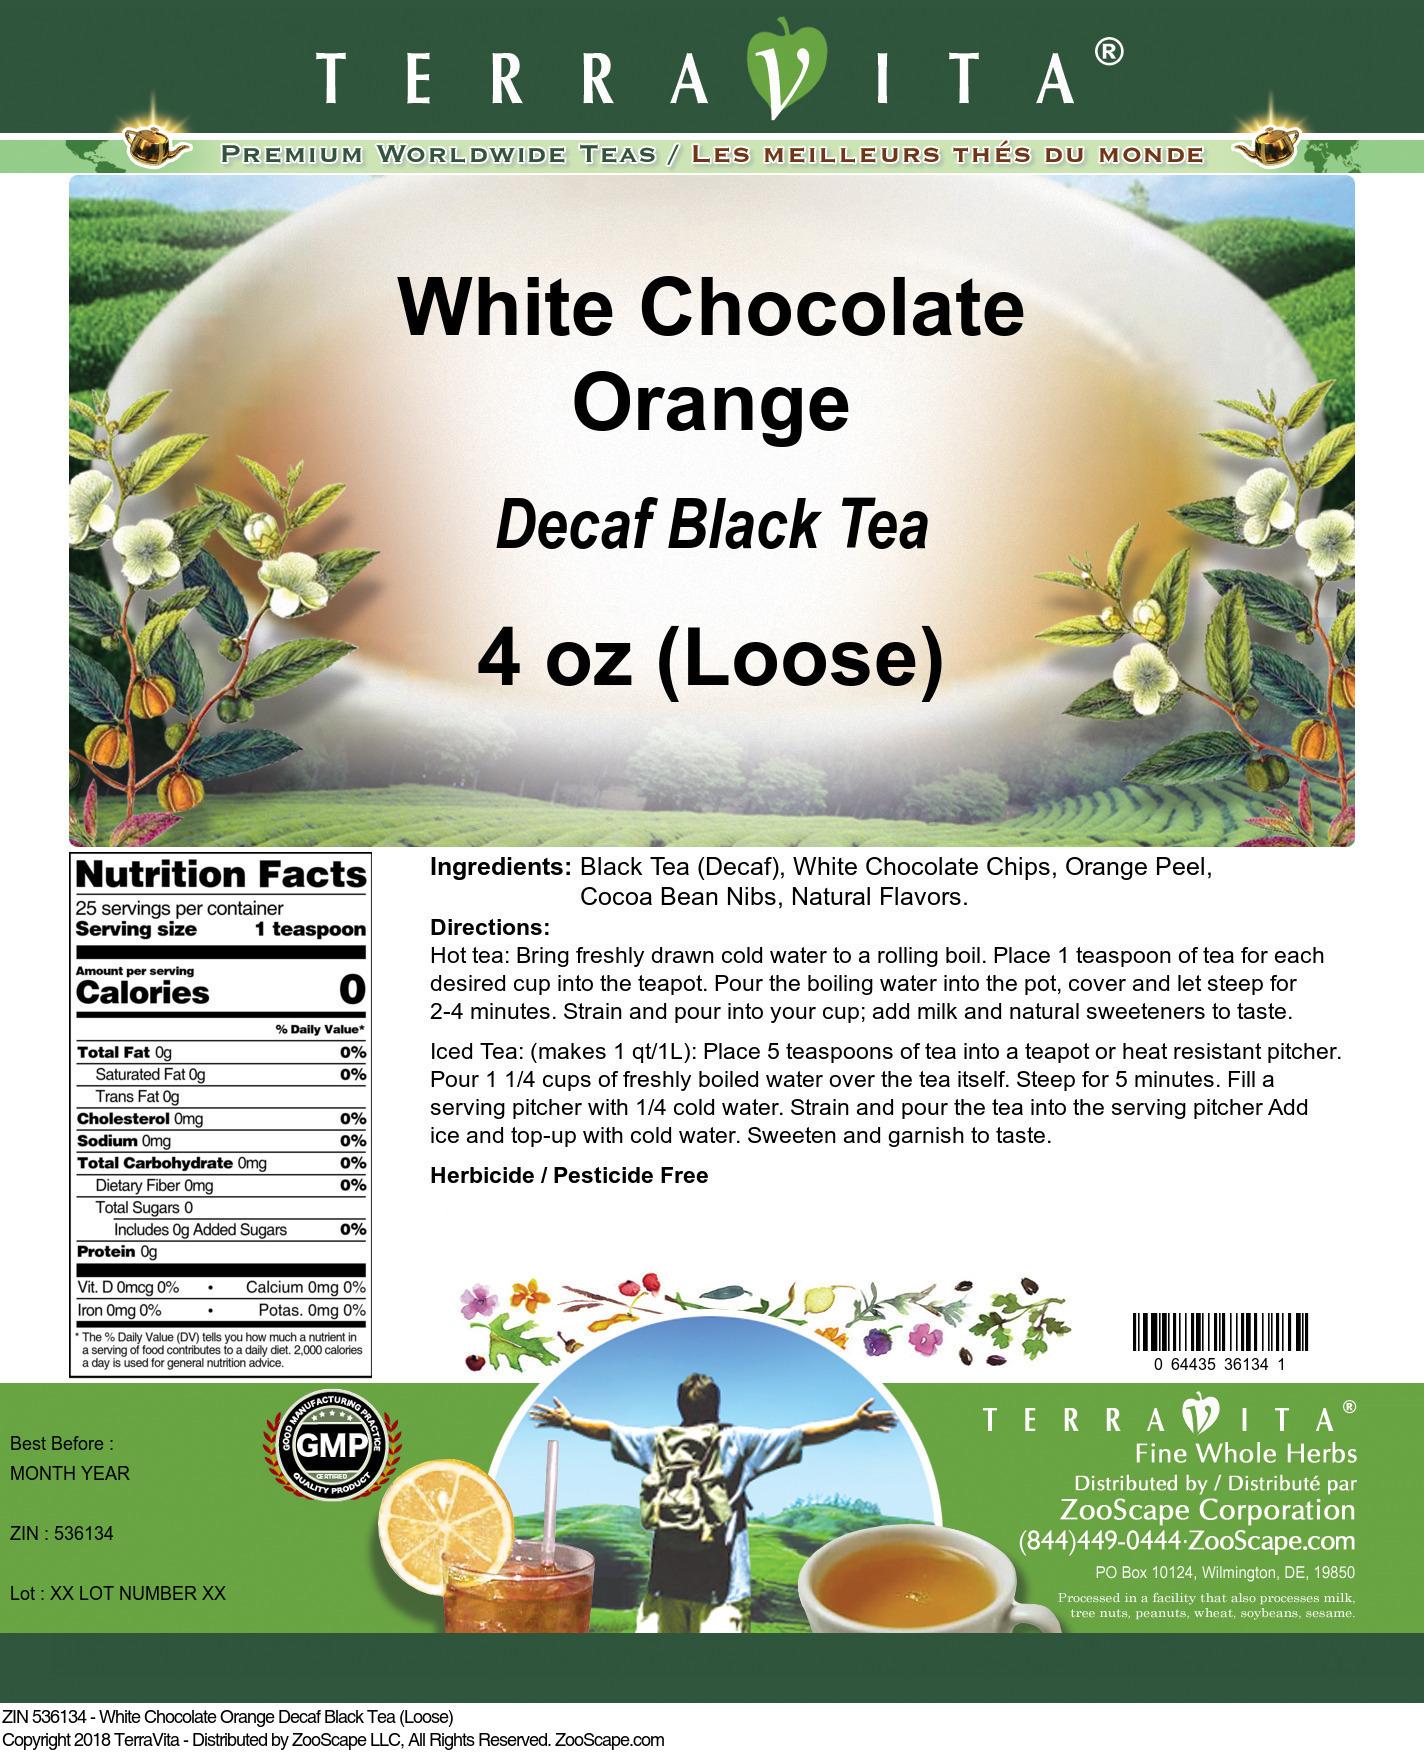 White Chocolate Orange Decaf Black Tea (Loose)